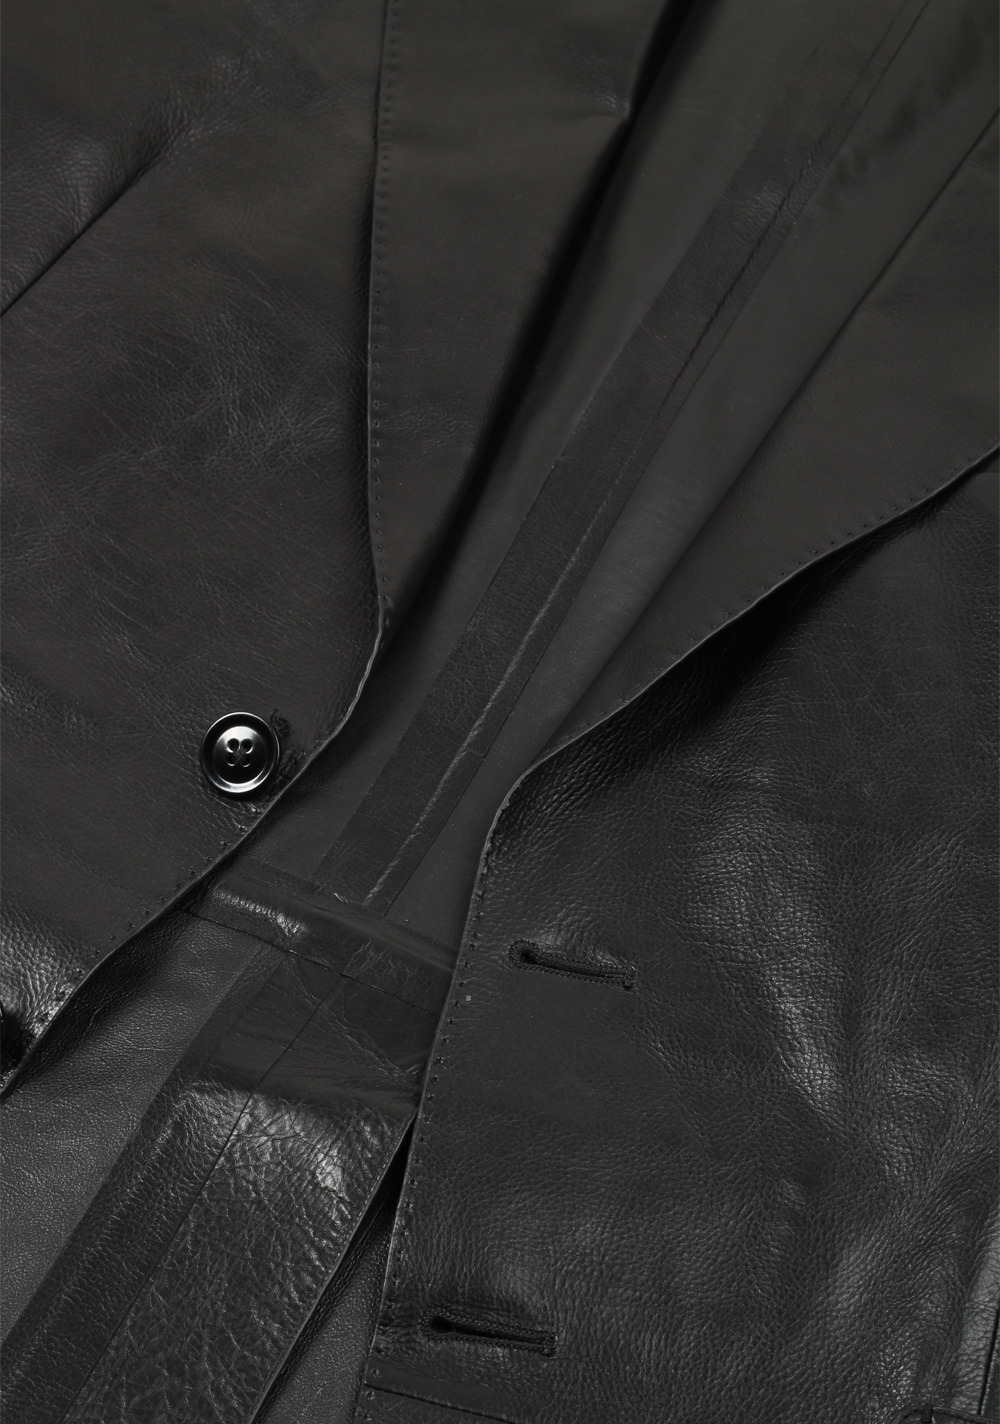 TOM FORD Black Leather Jacket Coat Size 48 / 38R U.S. | Costume Limité